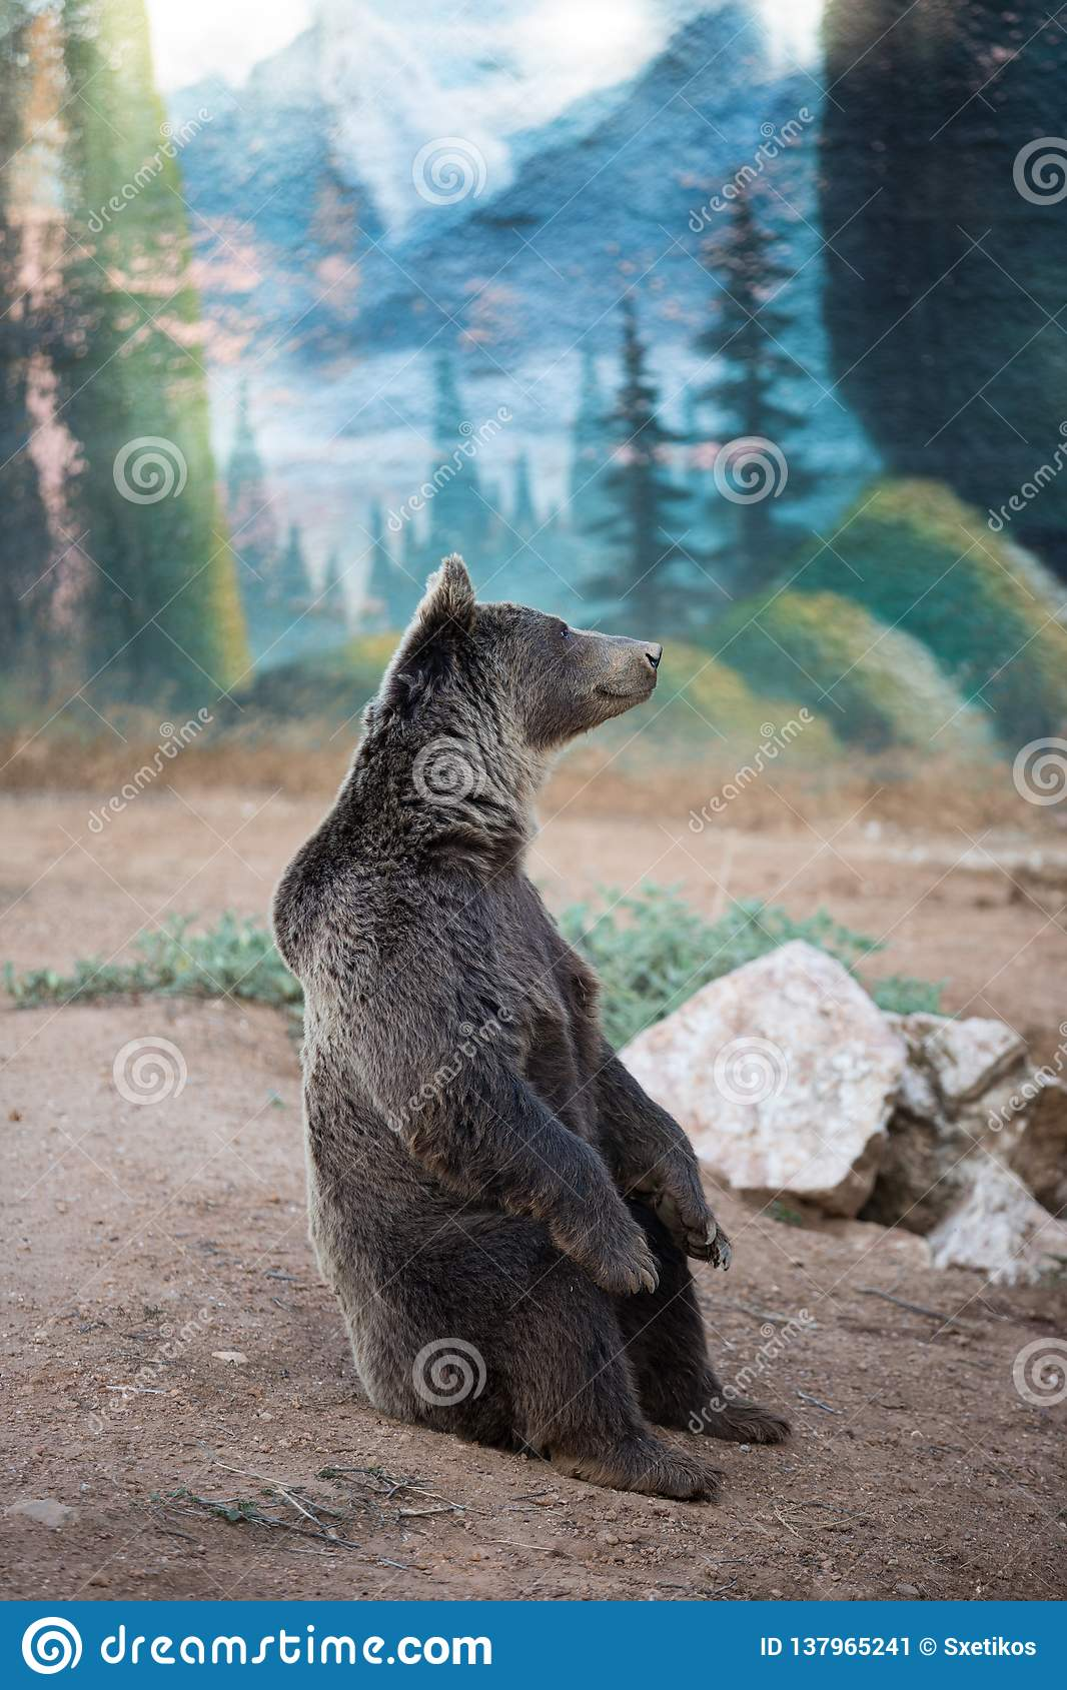 A brown bear sitting